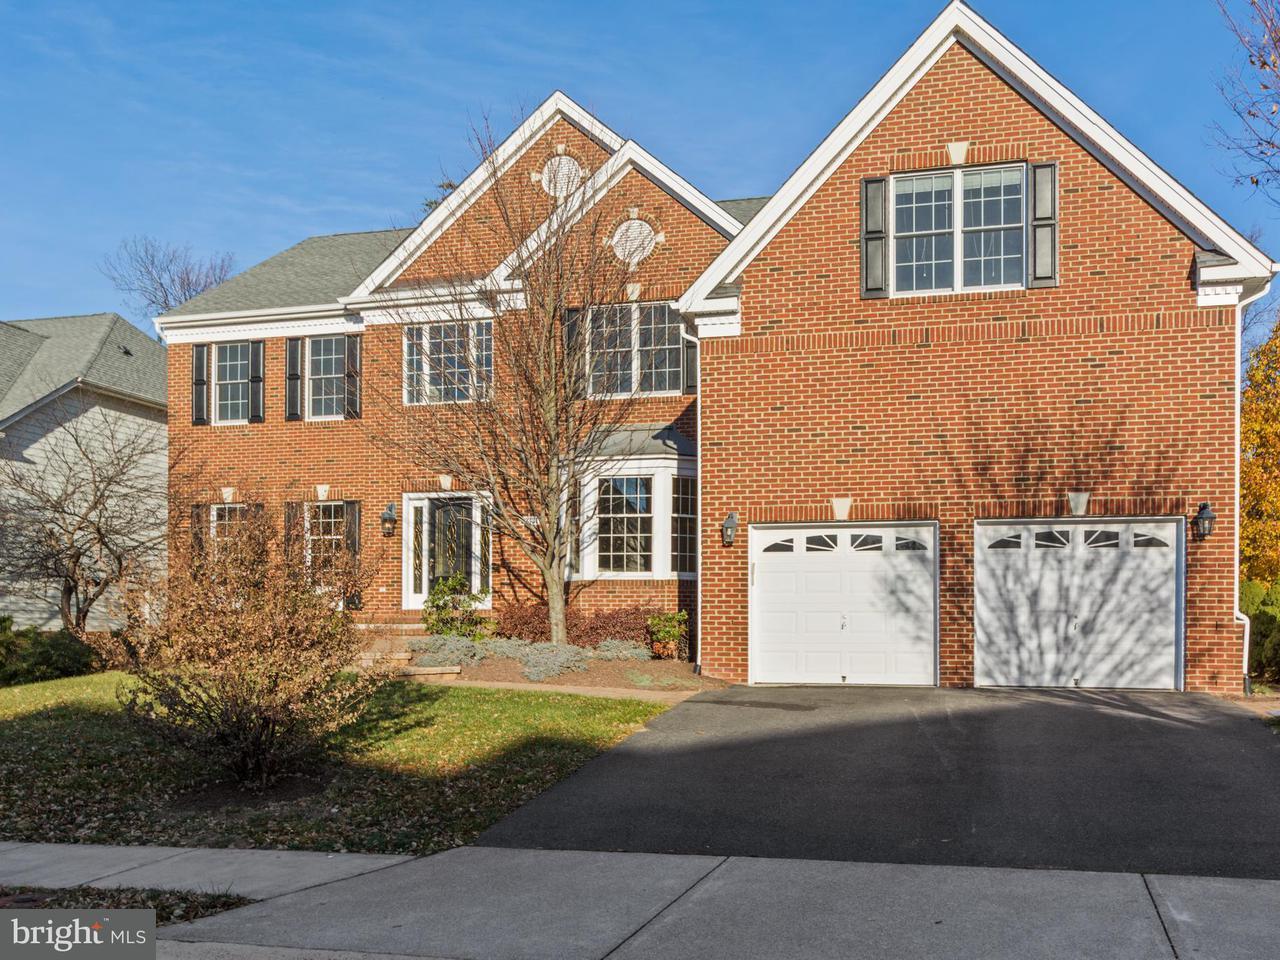 Single Family Home for Sale at 20331 KIAWAH ISLAND Drive 20331 KIAWAH ISLAND Drive Ashburn, Virginia 20147 United States